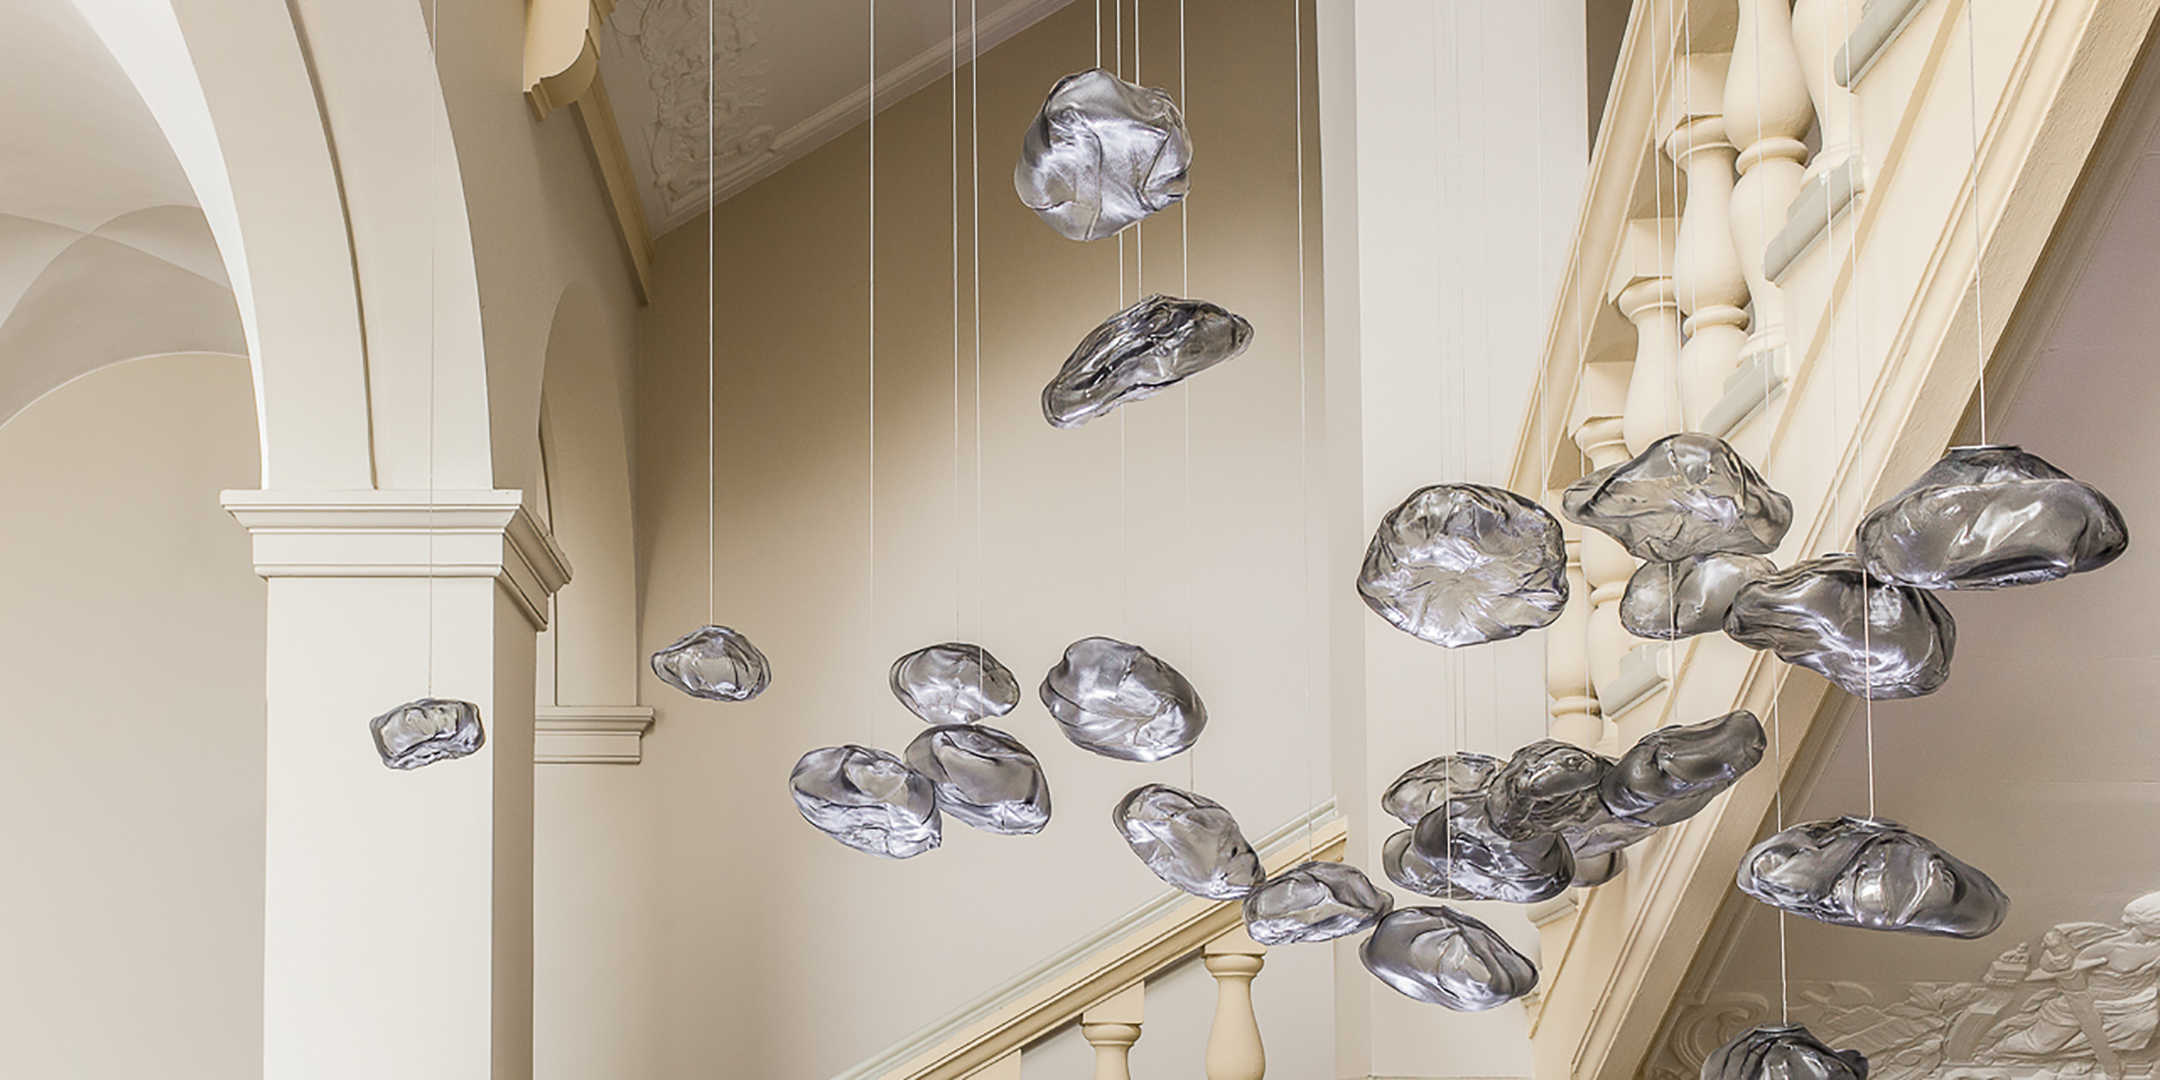 Lampade nuvola in fibra ceramica - Design Miss